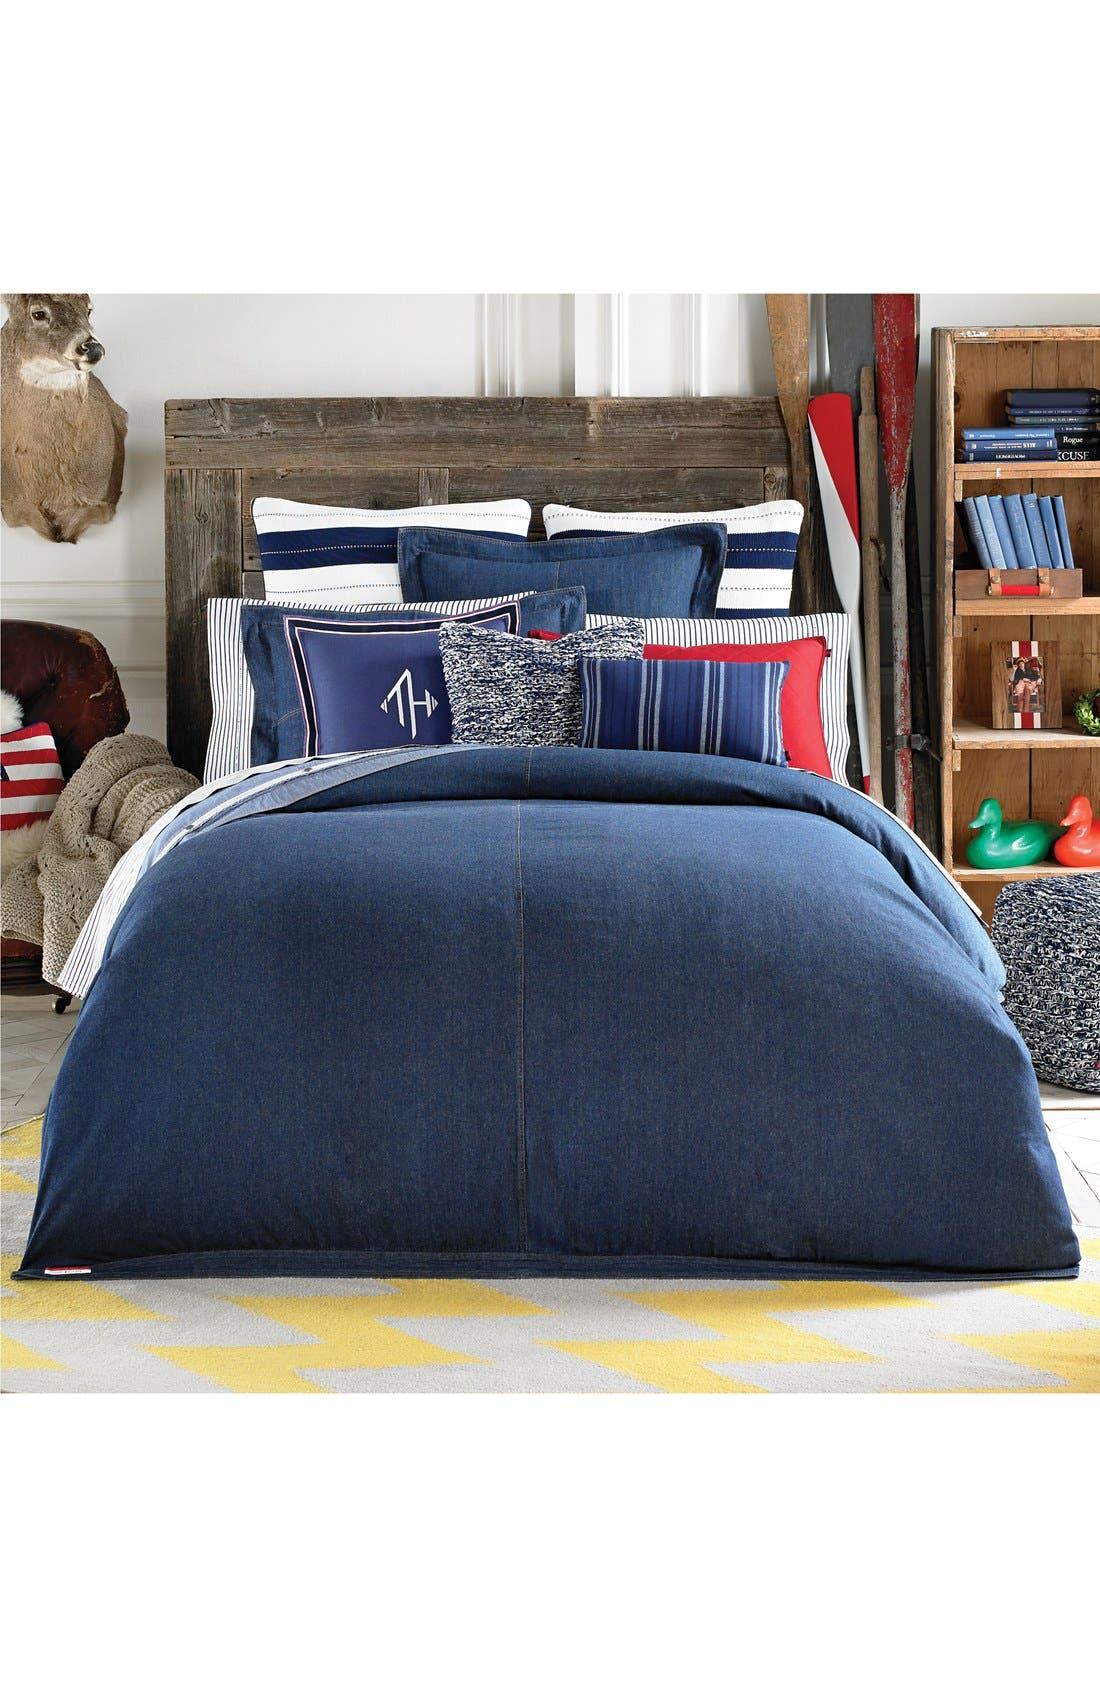 Denim Comforter,                             Main thumbnail 1, color,                             415